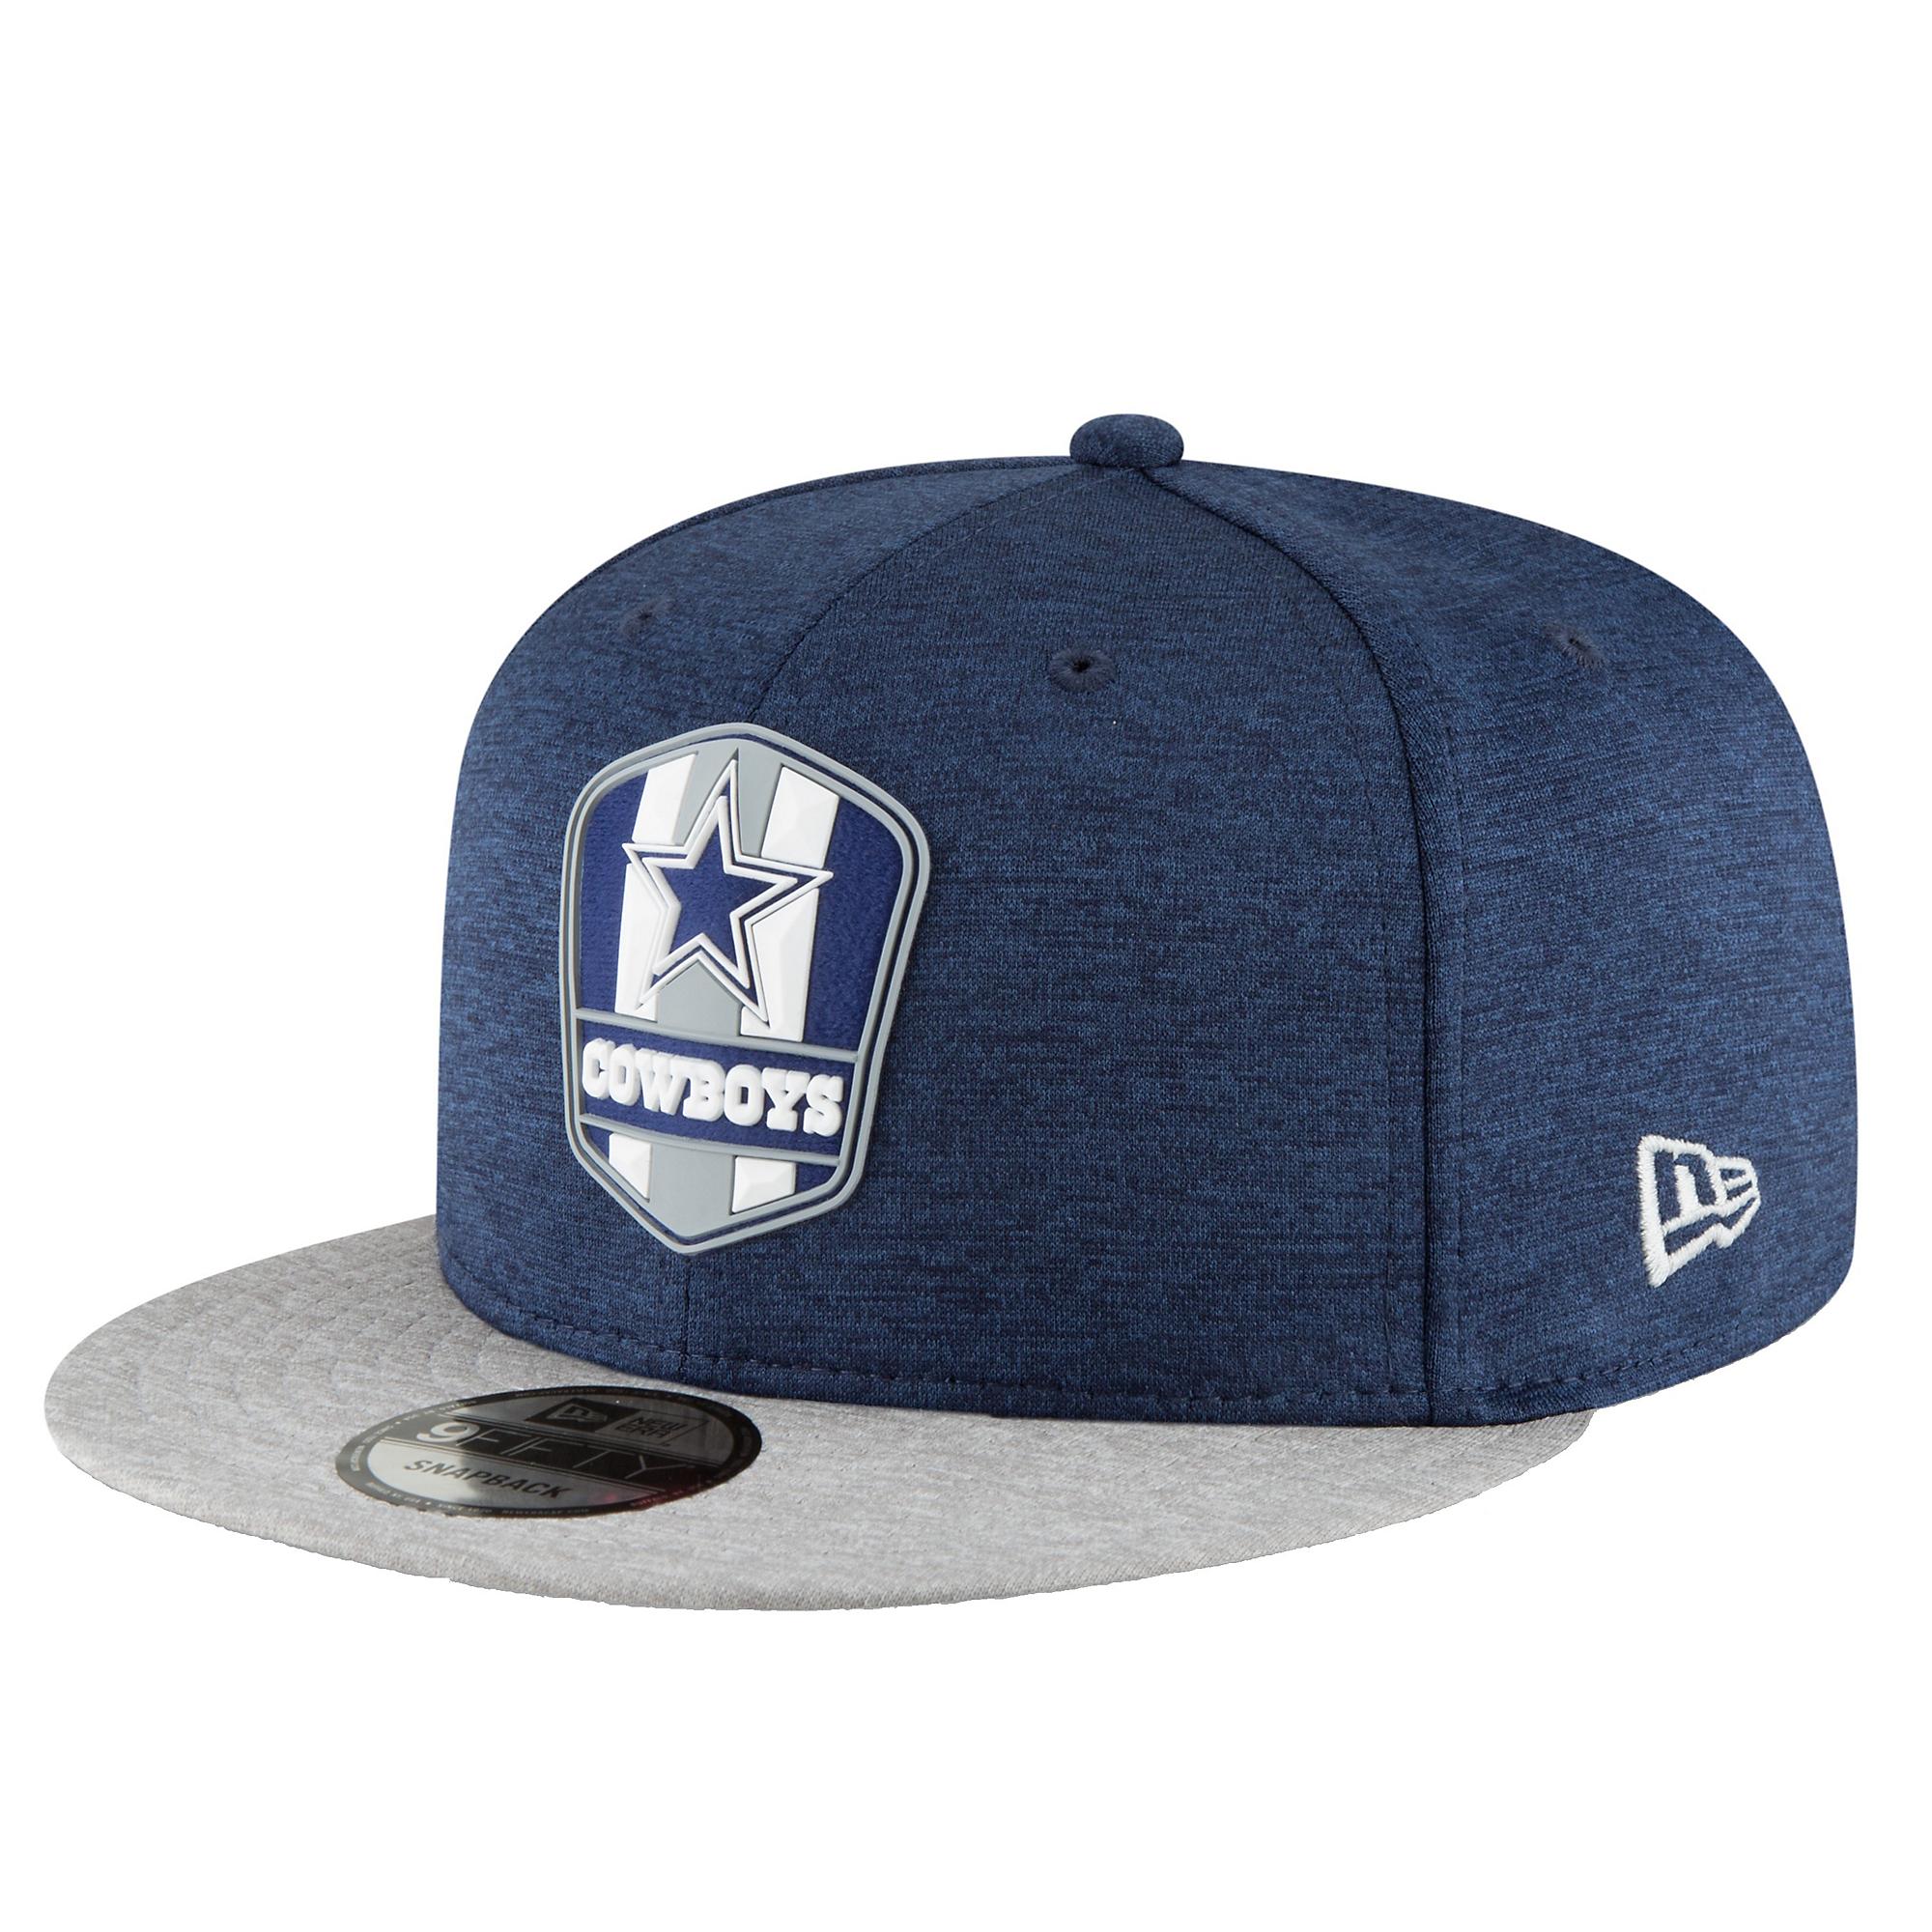 091a77057 Dallas Cowboys New Era Sideline Road 9Fifty Cap | Fans United